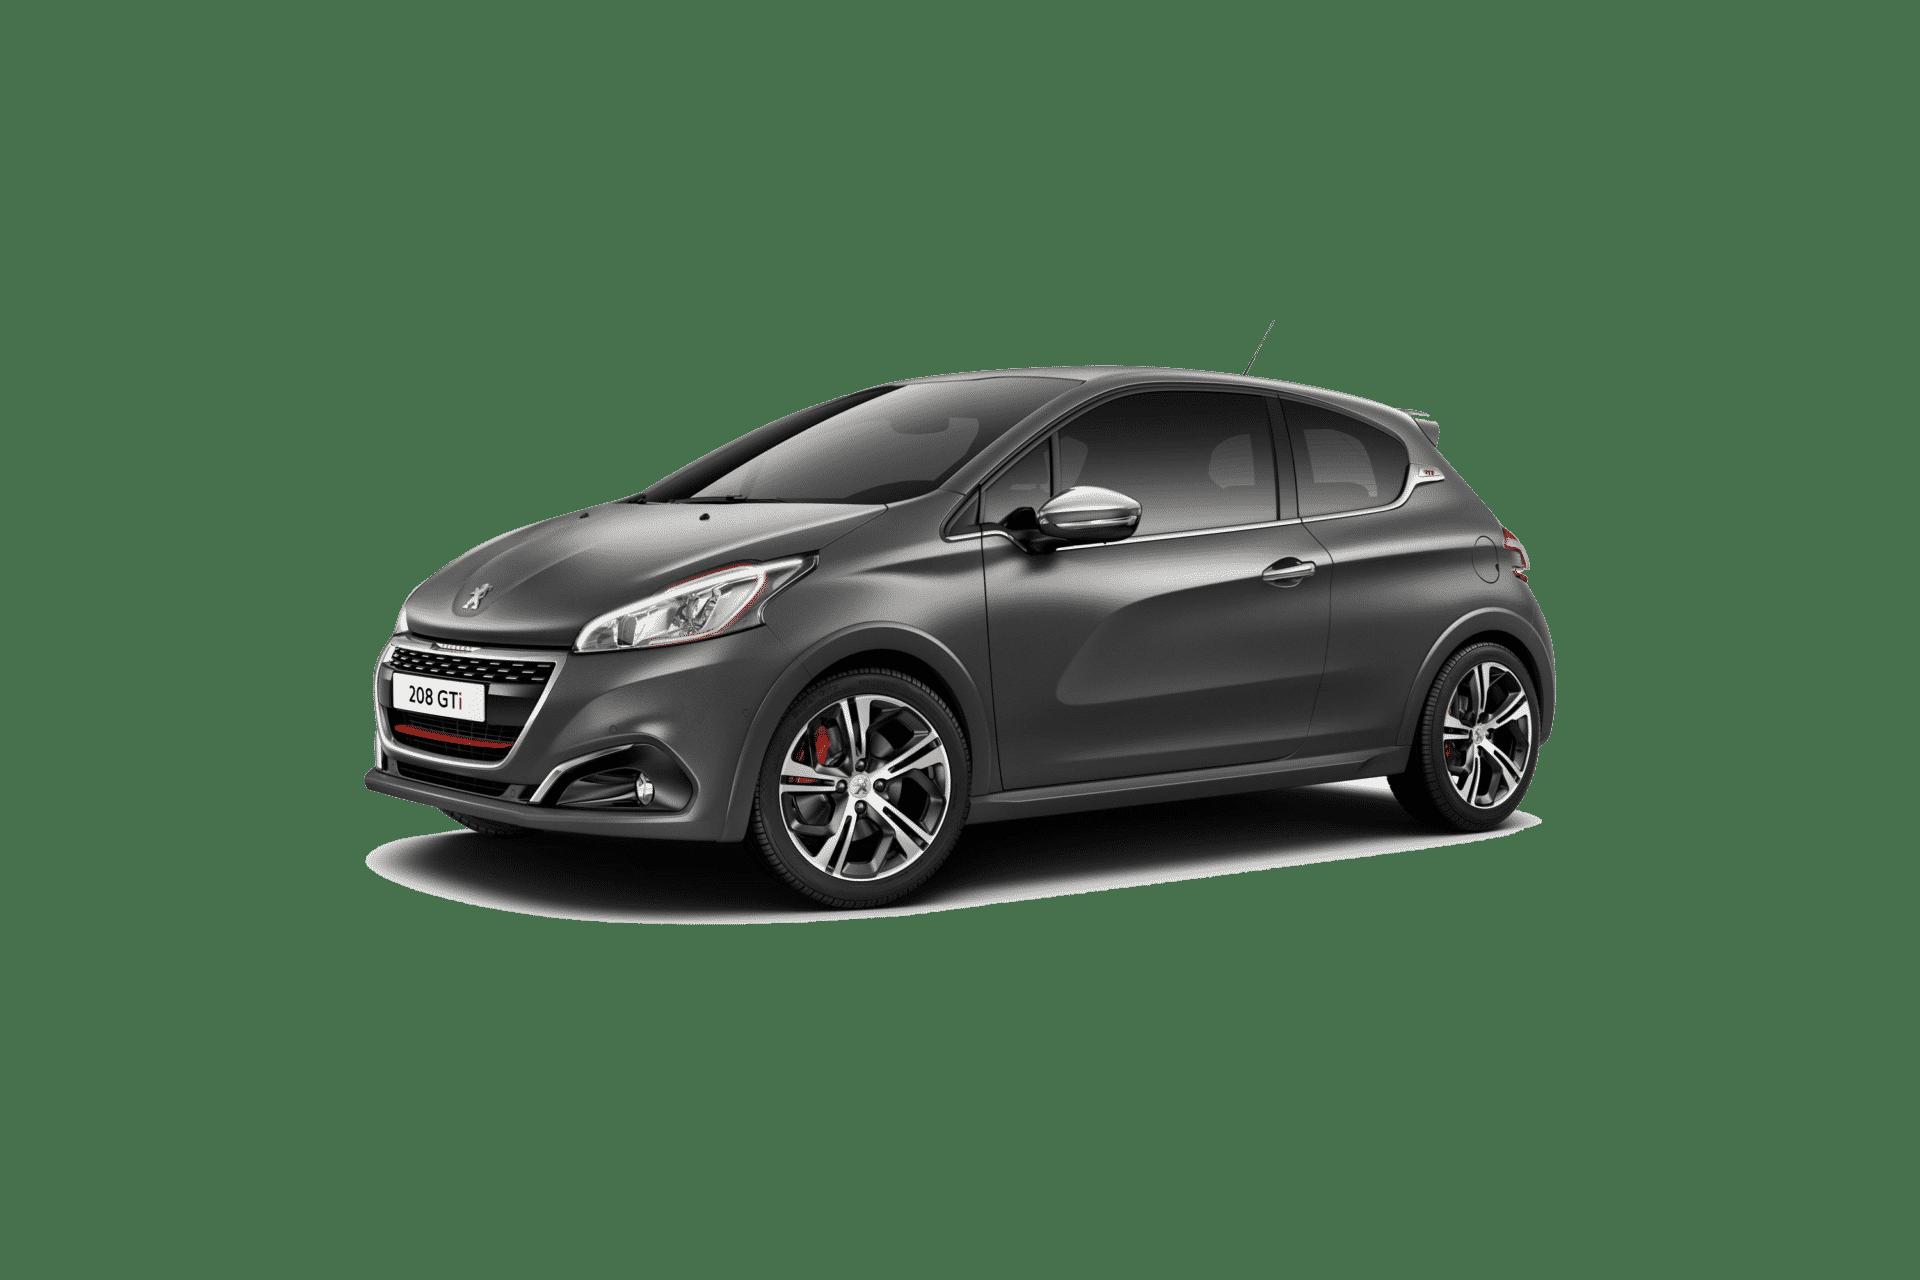 Peugeot-PNG-Image-File